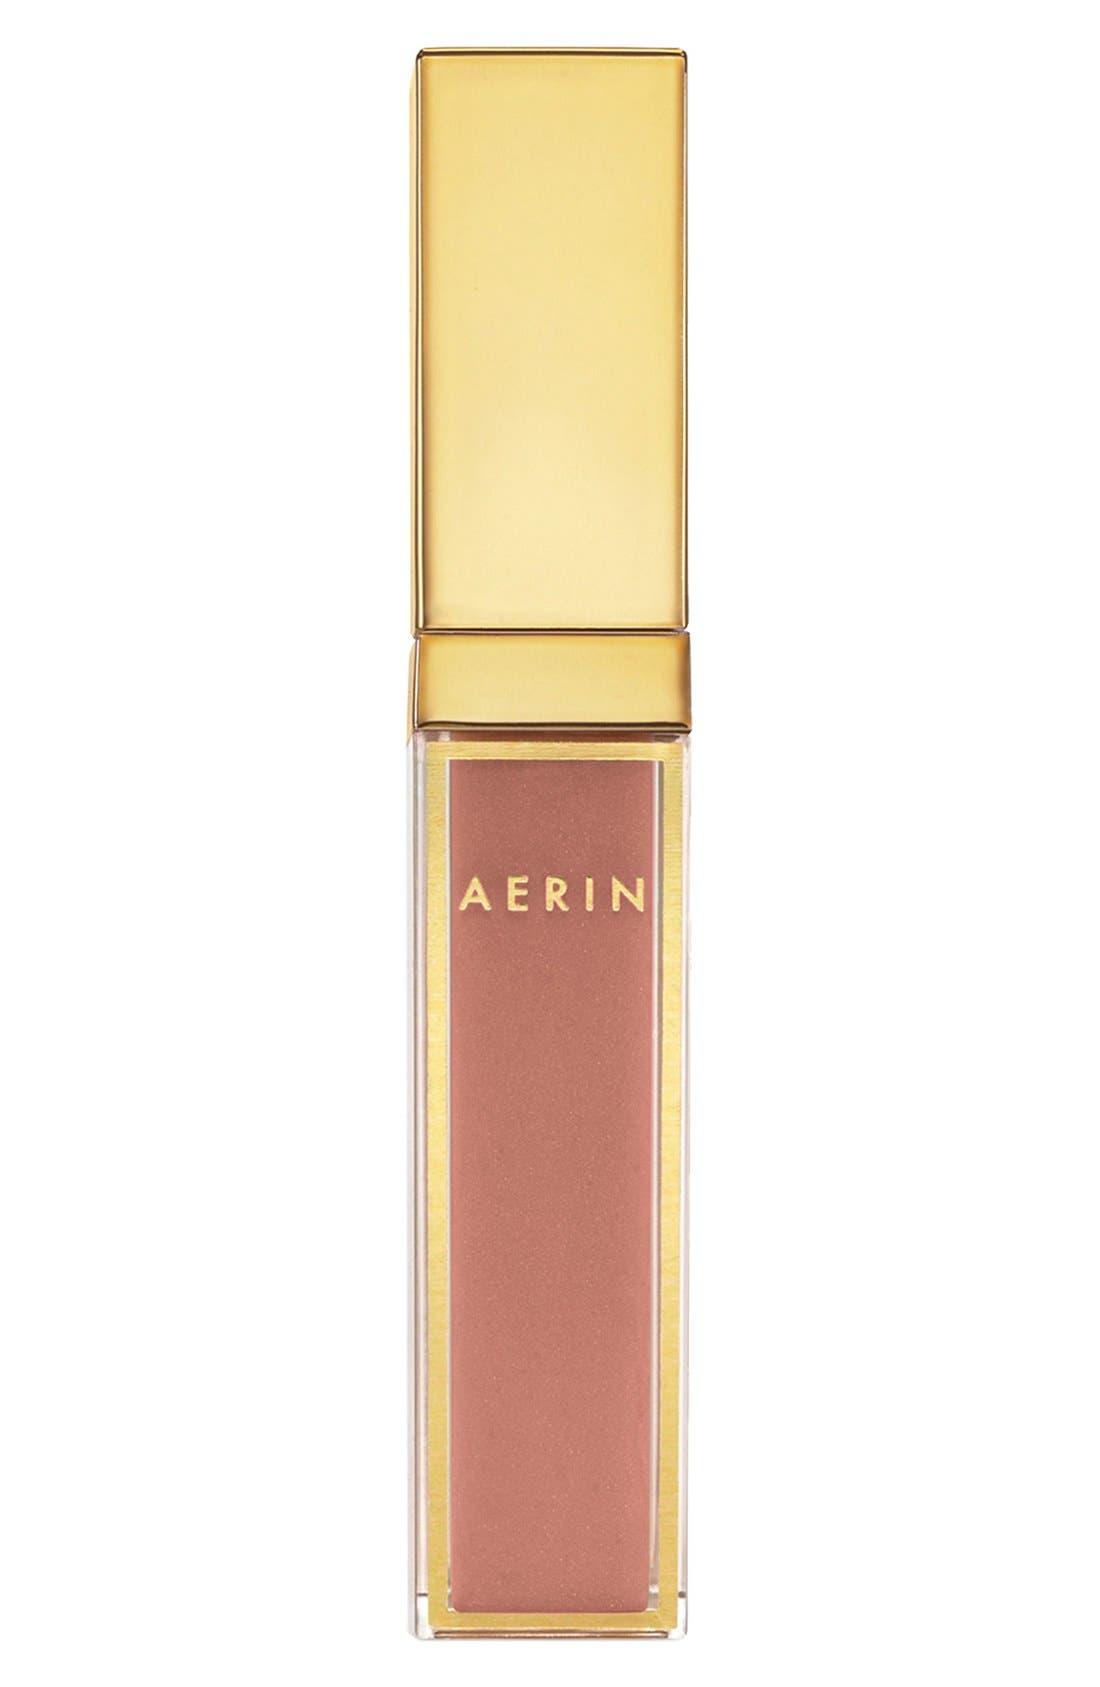 AERIN Beauty Lip Gloss,                             Main thumbnail 1, color,                             250